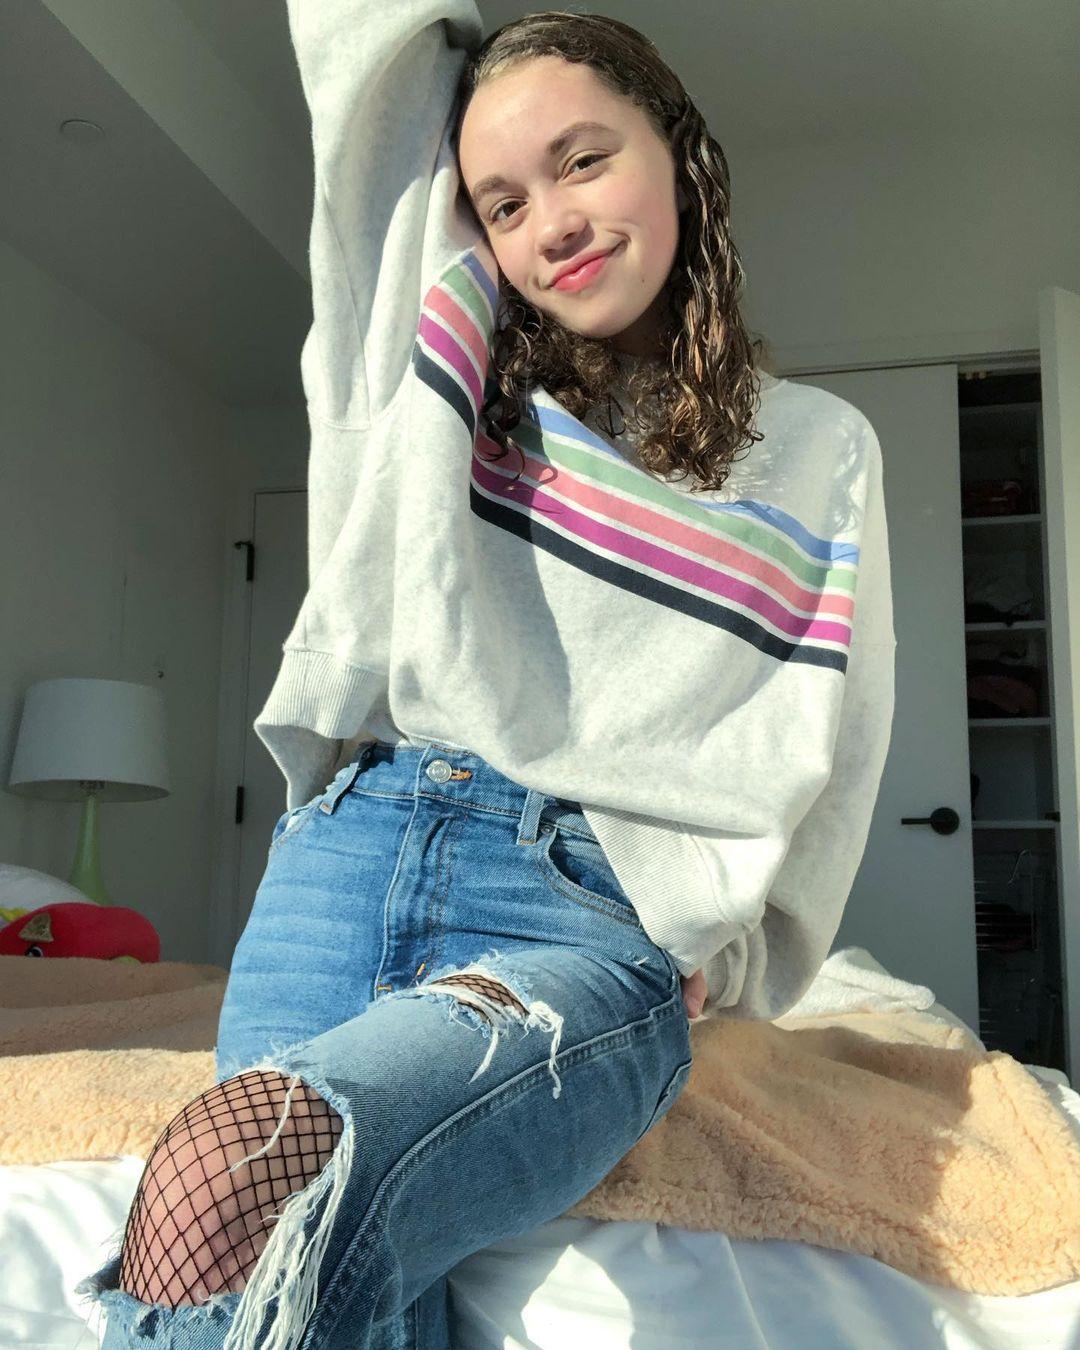 Jillian-Shea-Spaeder-3